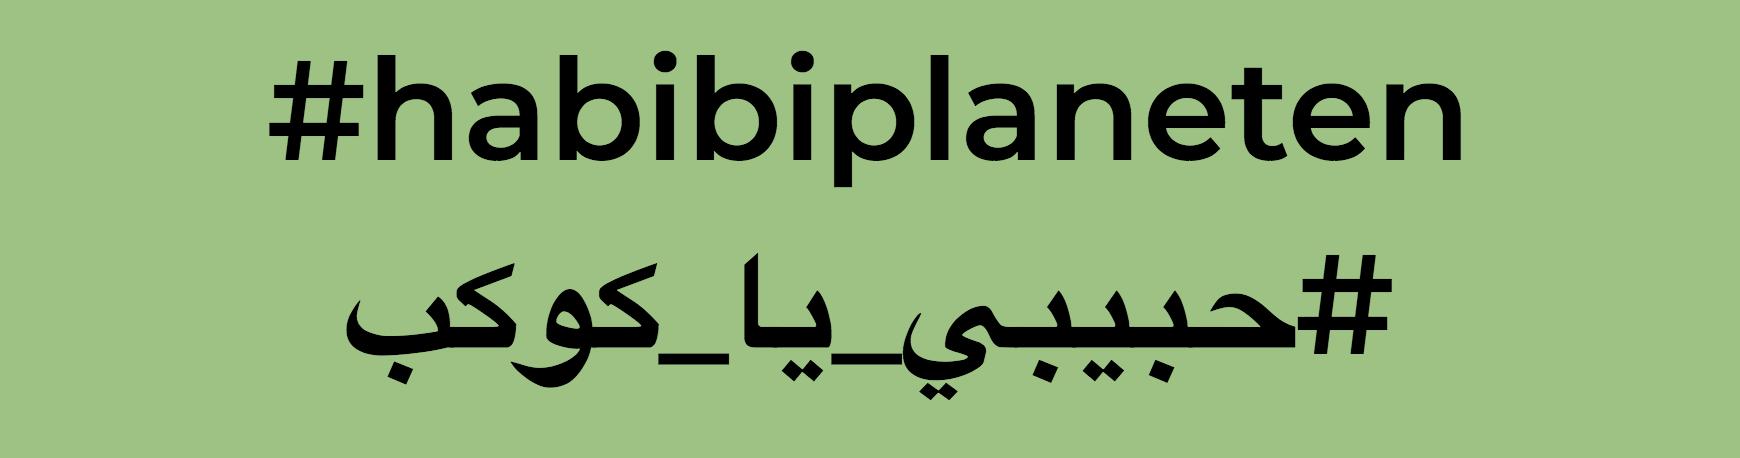 habibiplaneten_header_hashtag.png